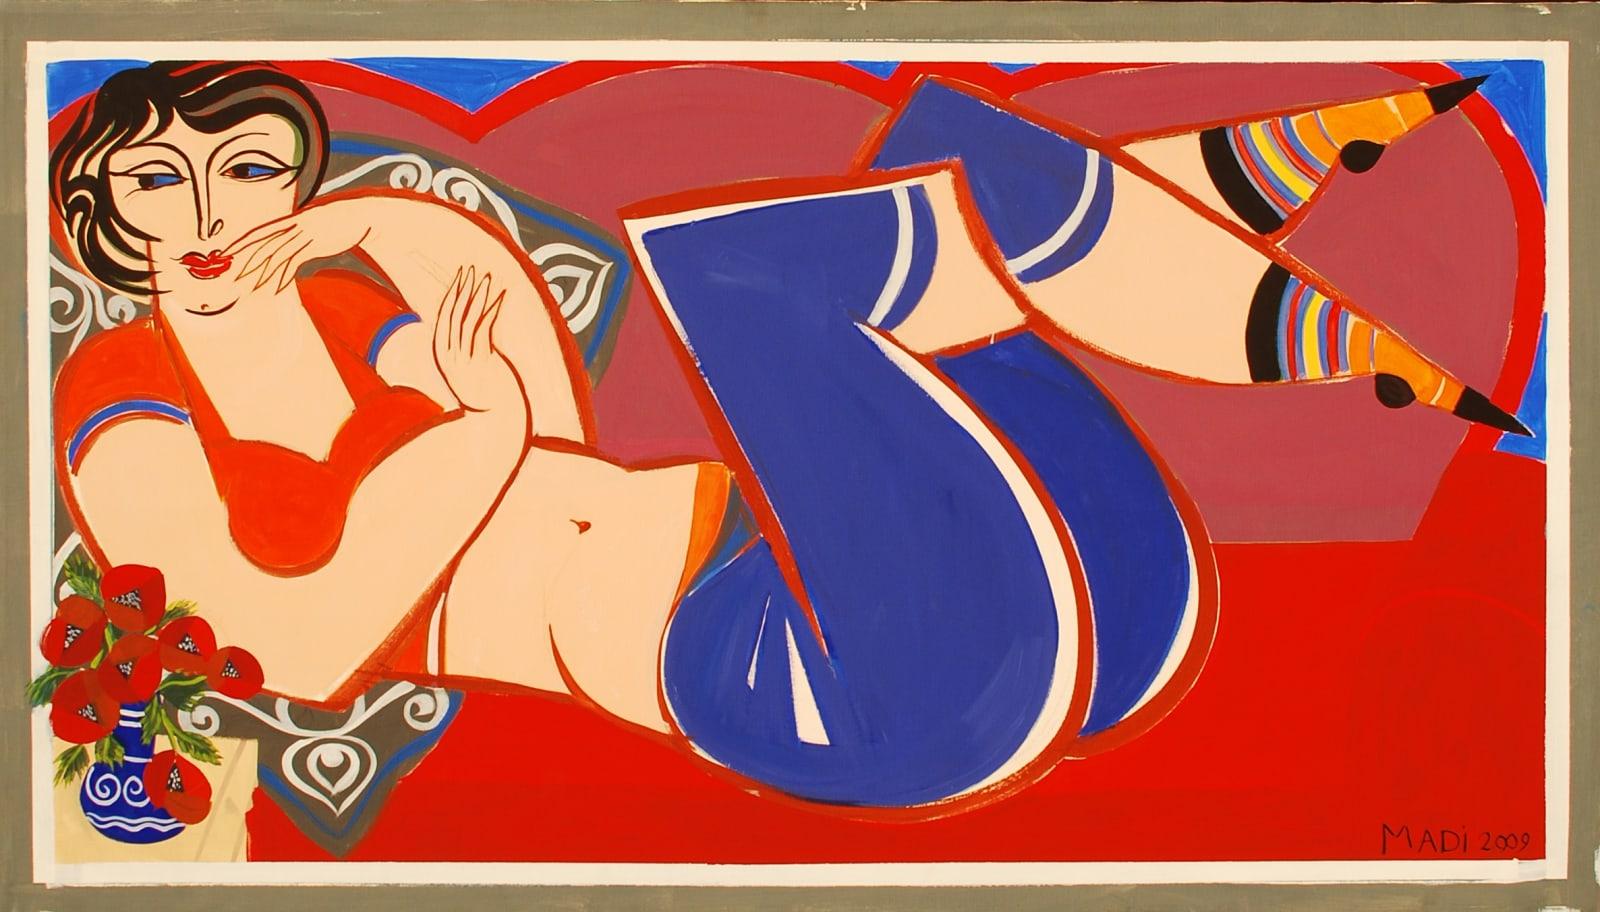 Hussein Madi, Untitled, 80x140, 2009, acrylic on canvas